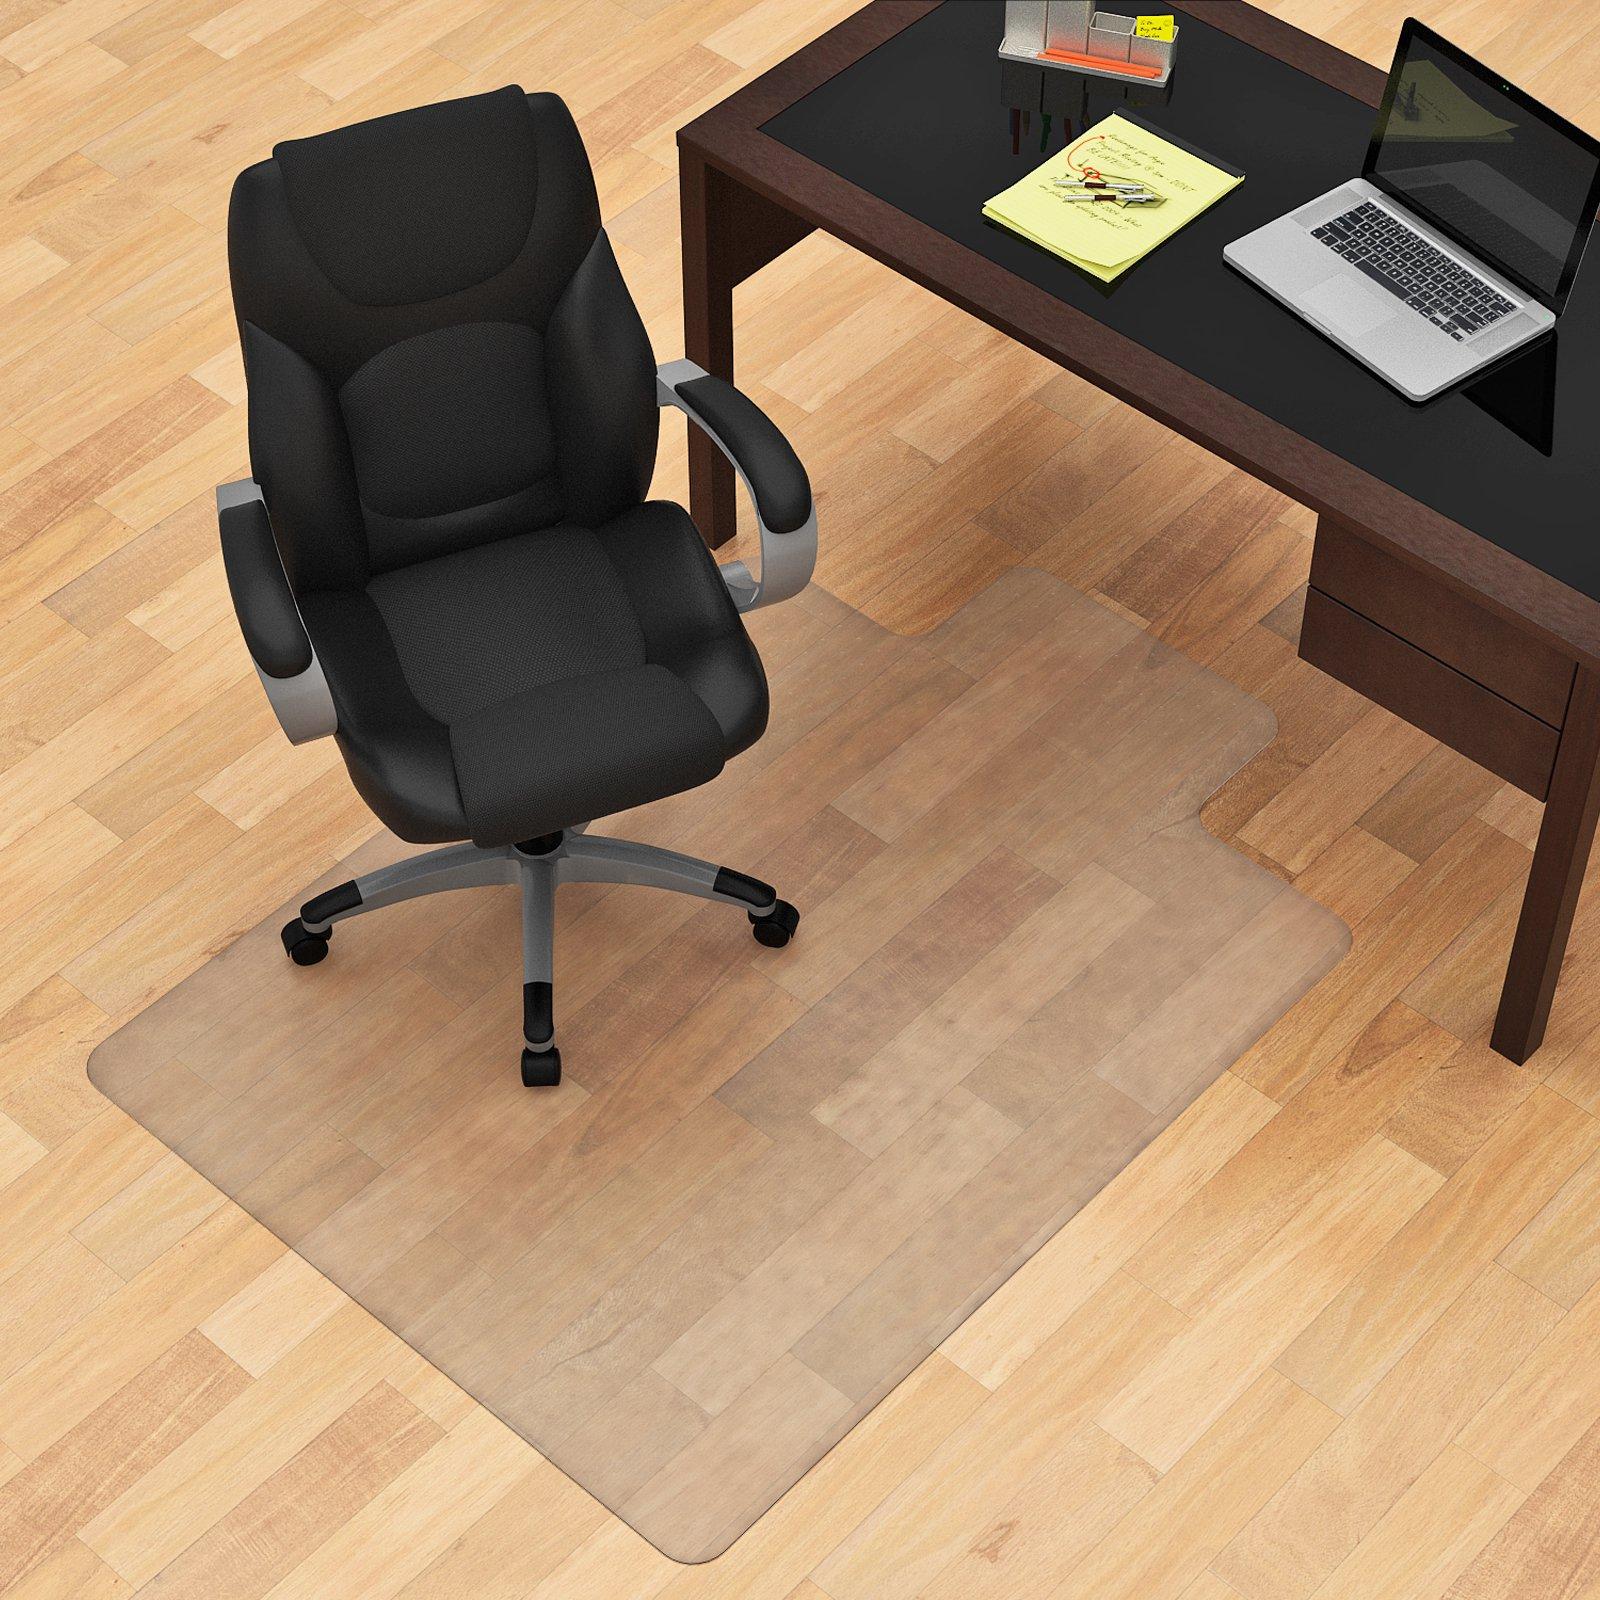 Upc 846158010801 Z Line 45x53 Hard Floor Chairmat